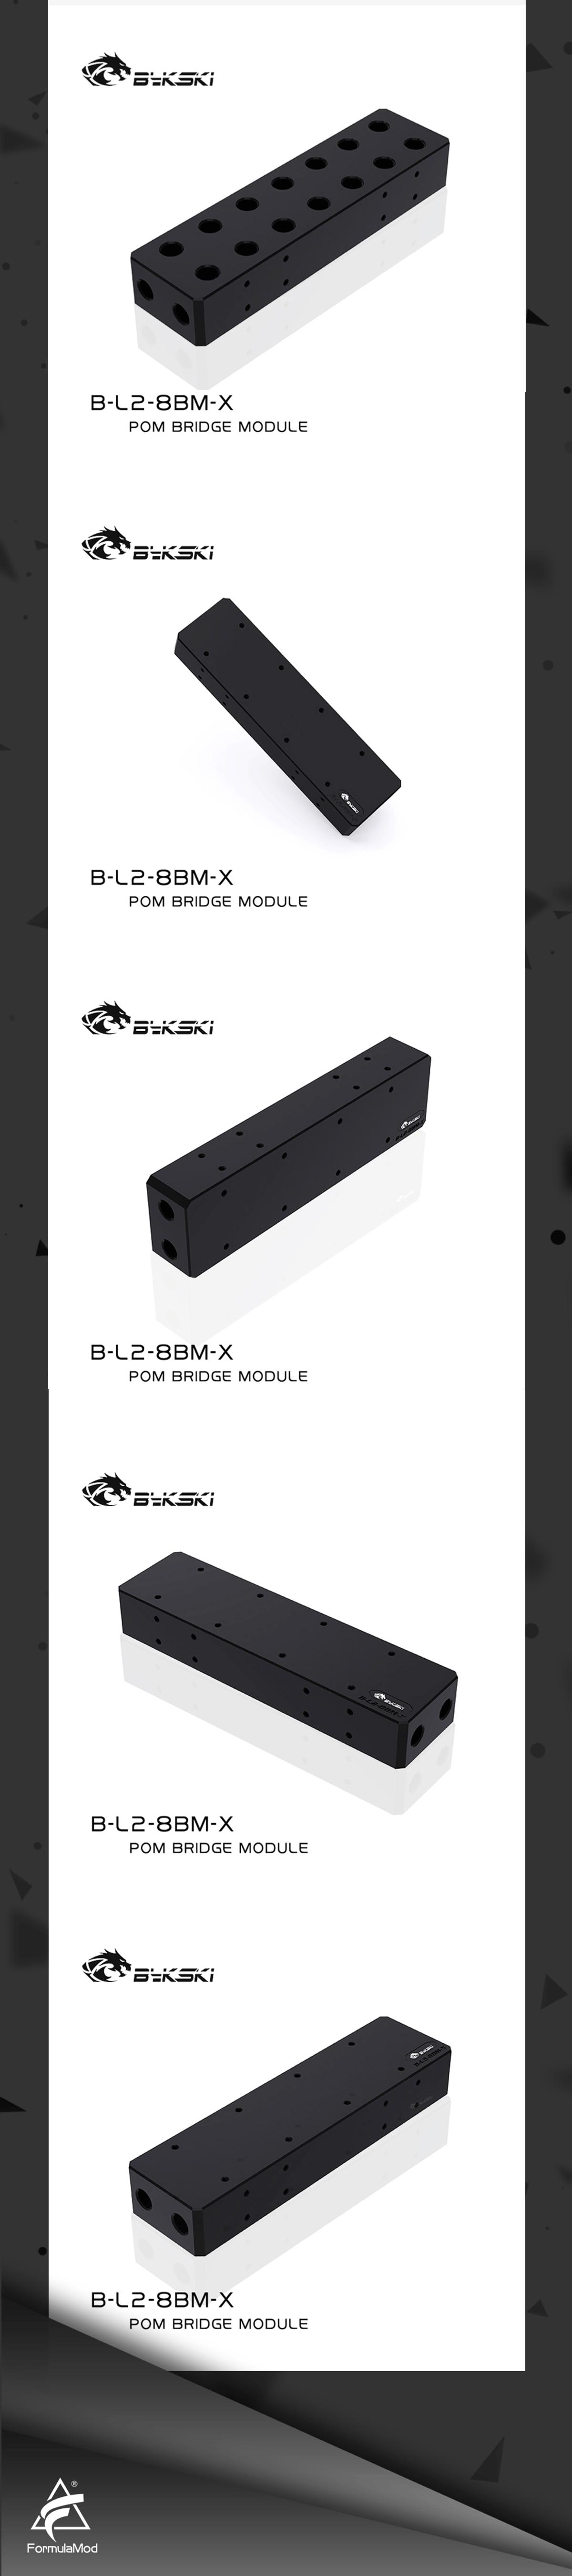 Bykski B-L2-8BM-X GPU Terminal Block for Computer Graphics Card Water Cooling Block Bridging Module Adapter POM Connectors